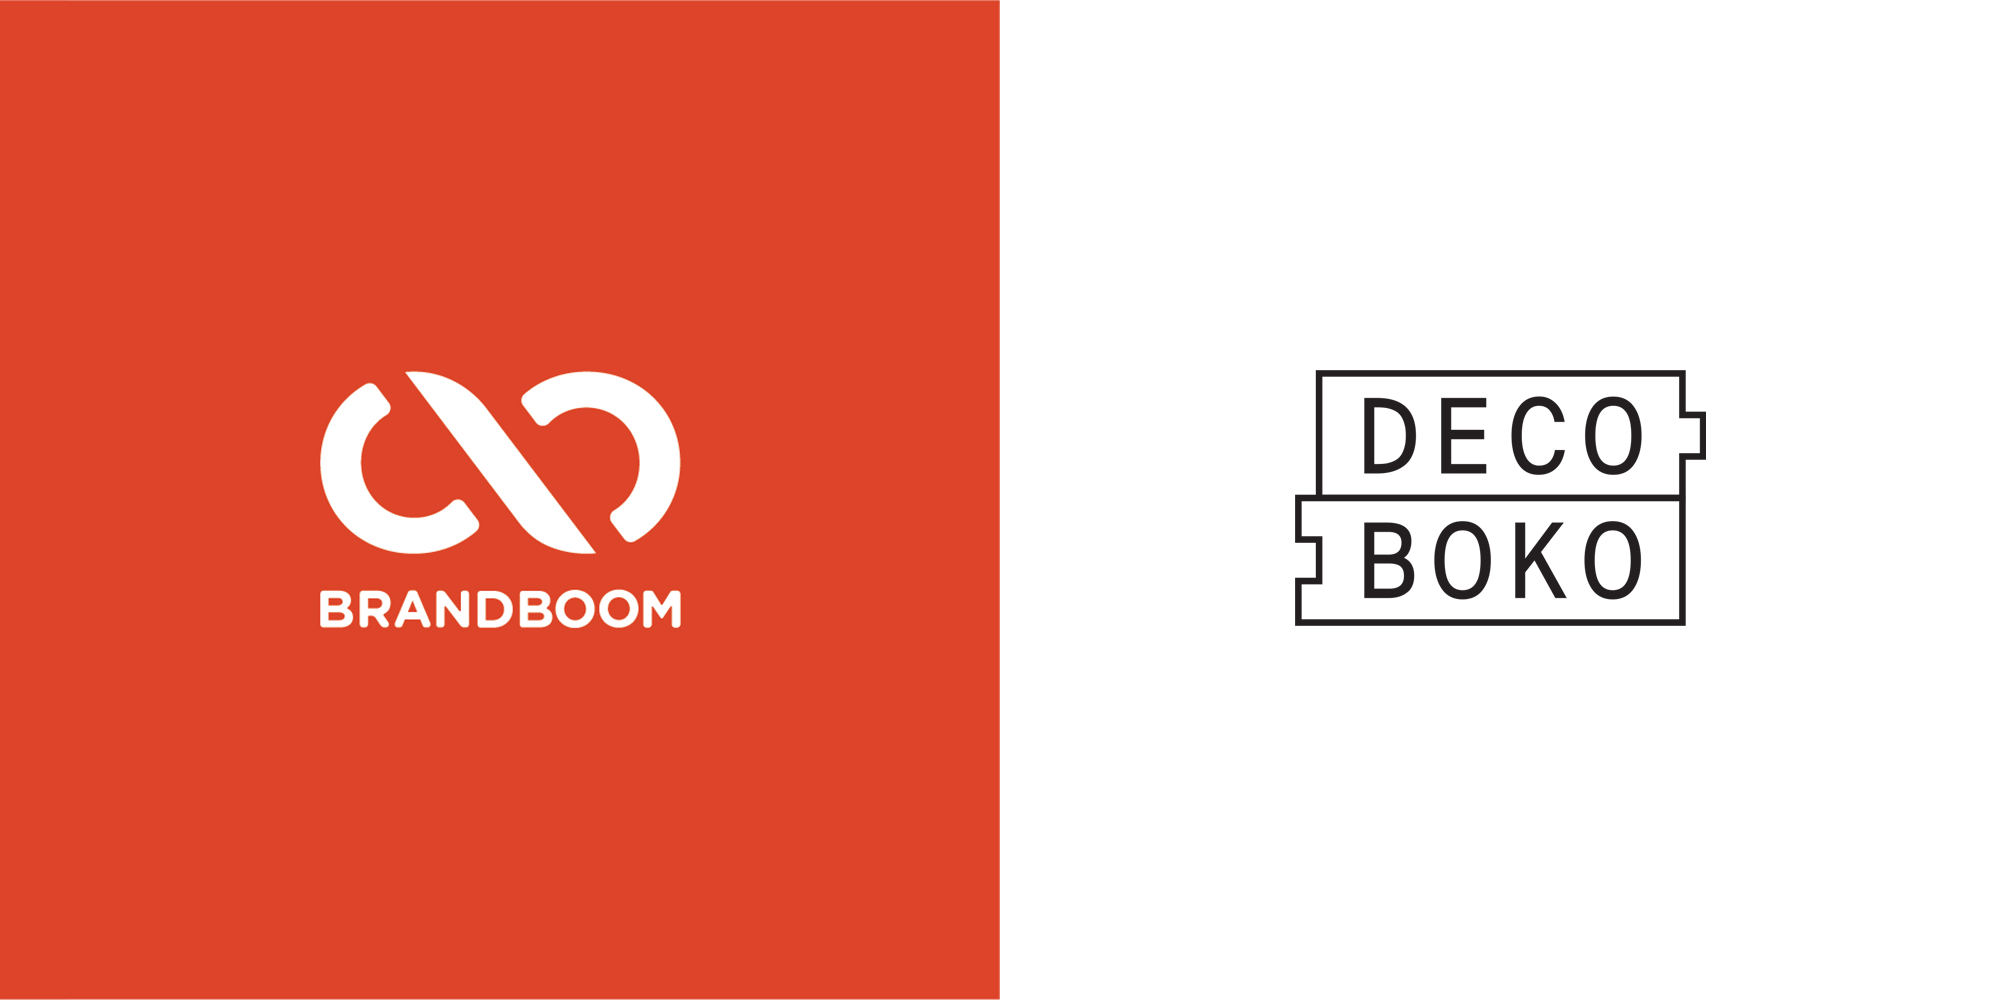 Brandboom / DECO BOKO